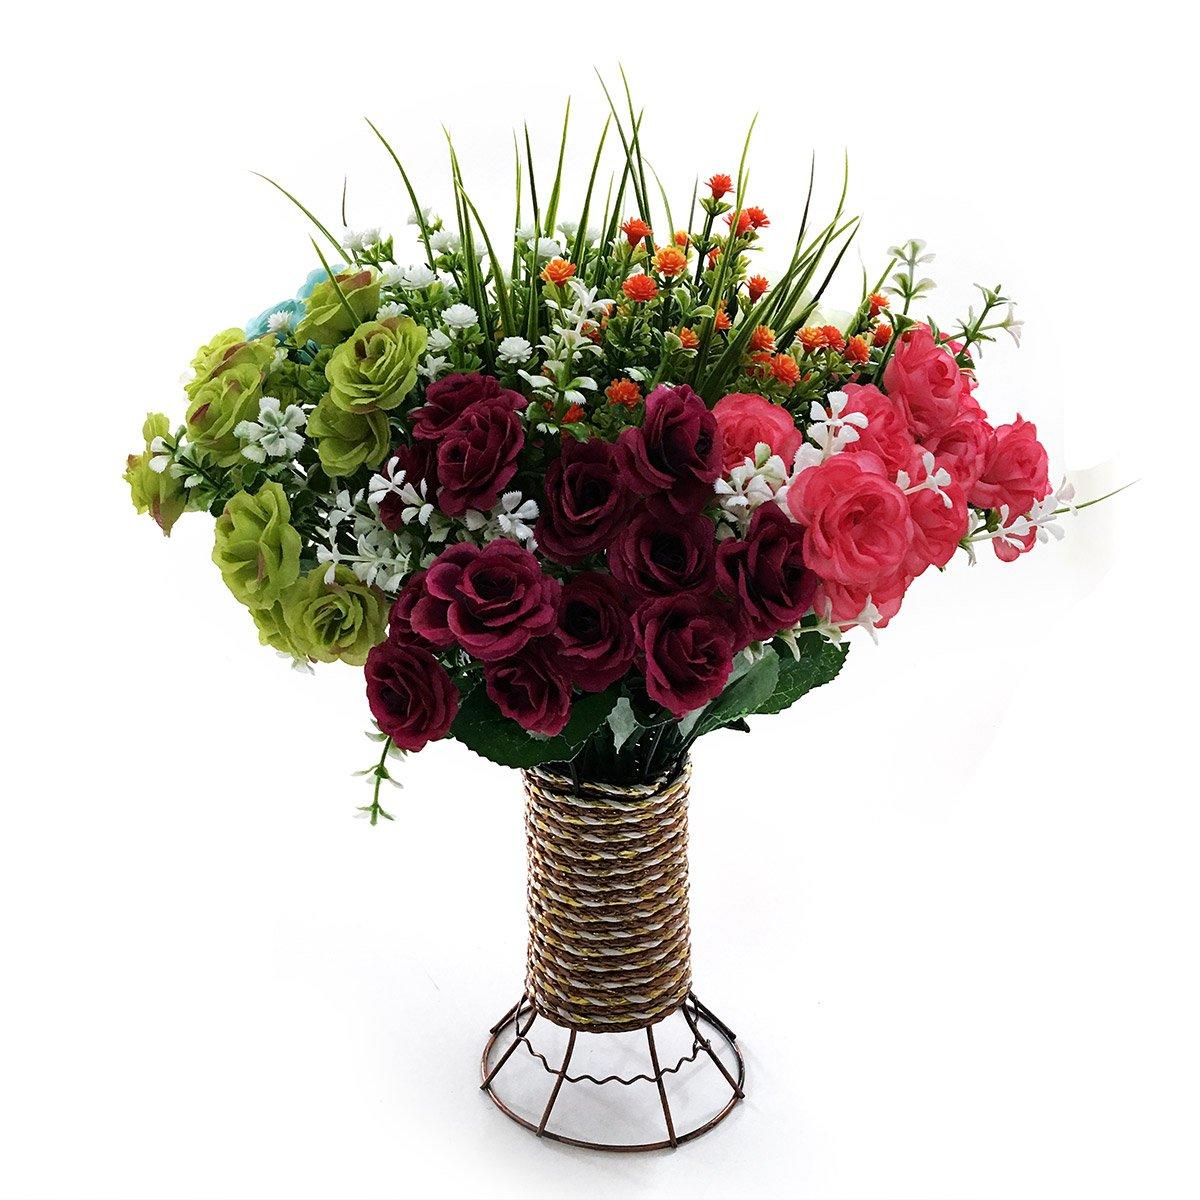 Amazon Artificial Flowers 8 Bundles Fake Flowers Bouquet With